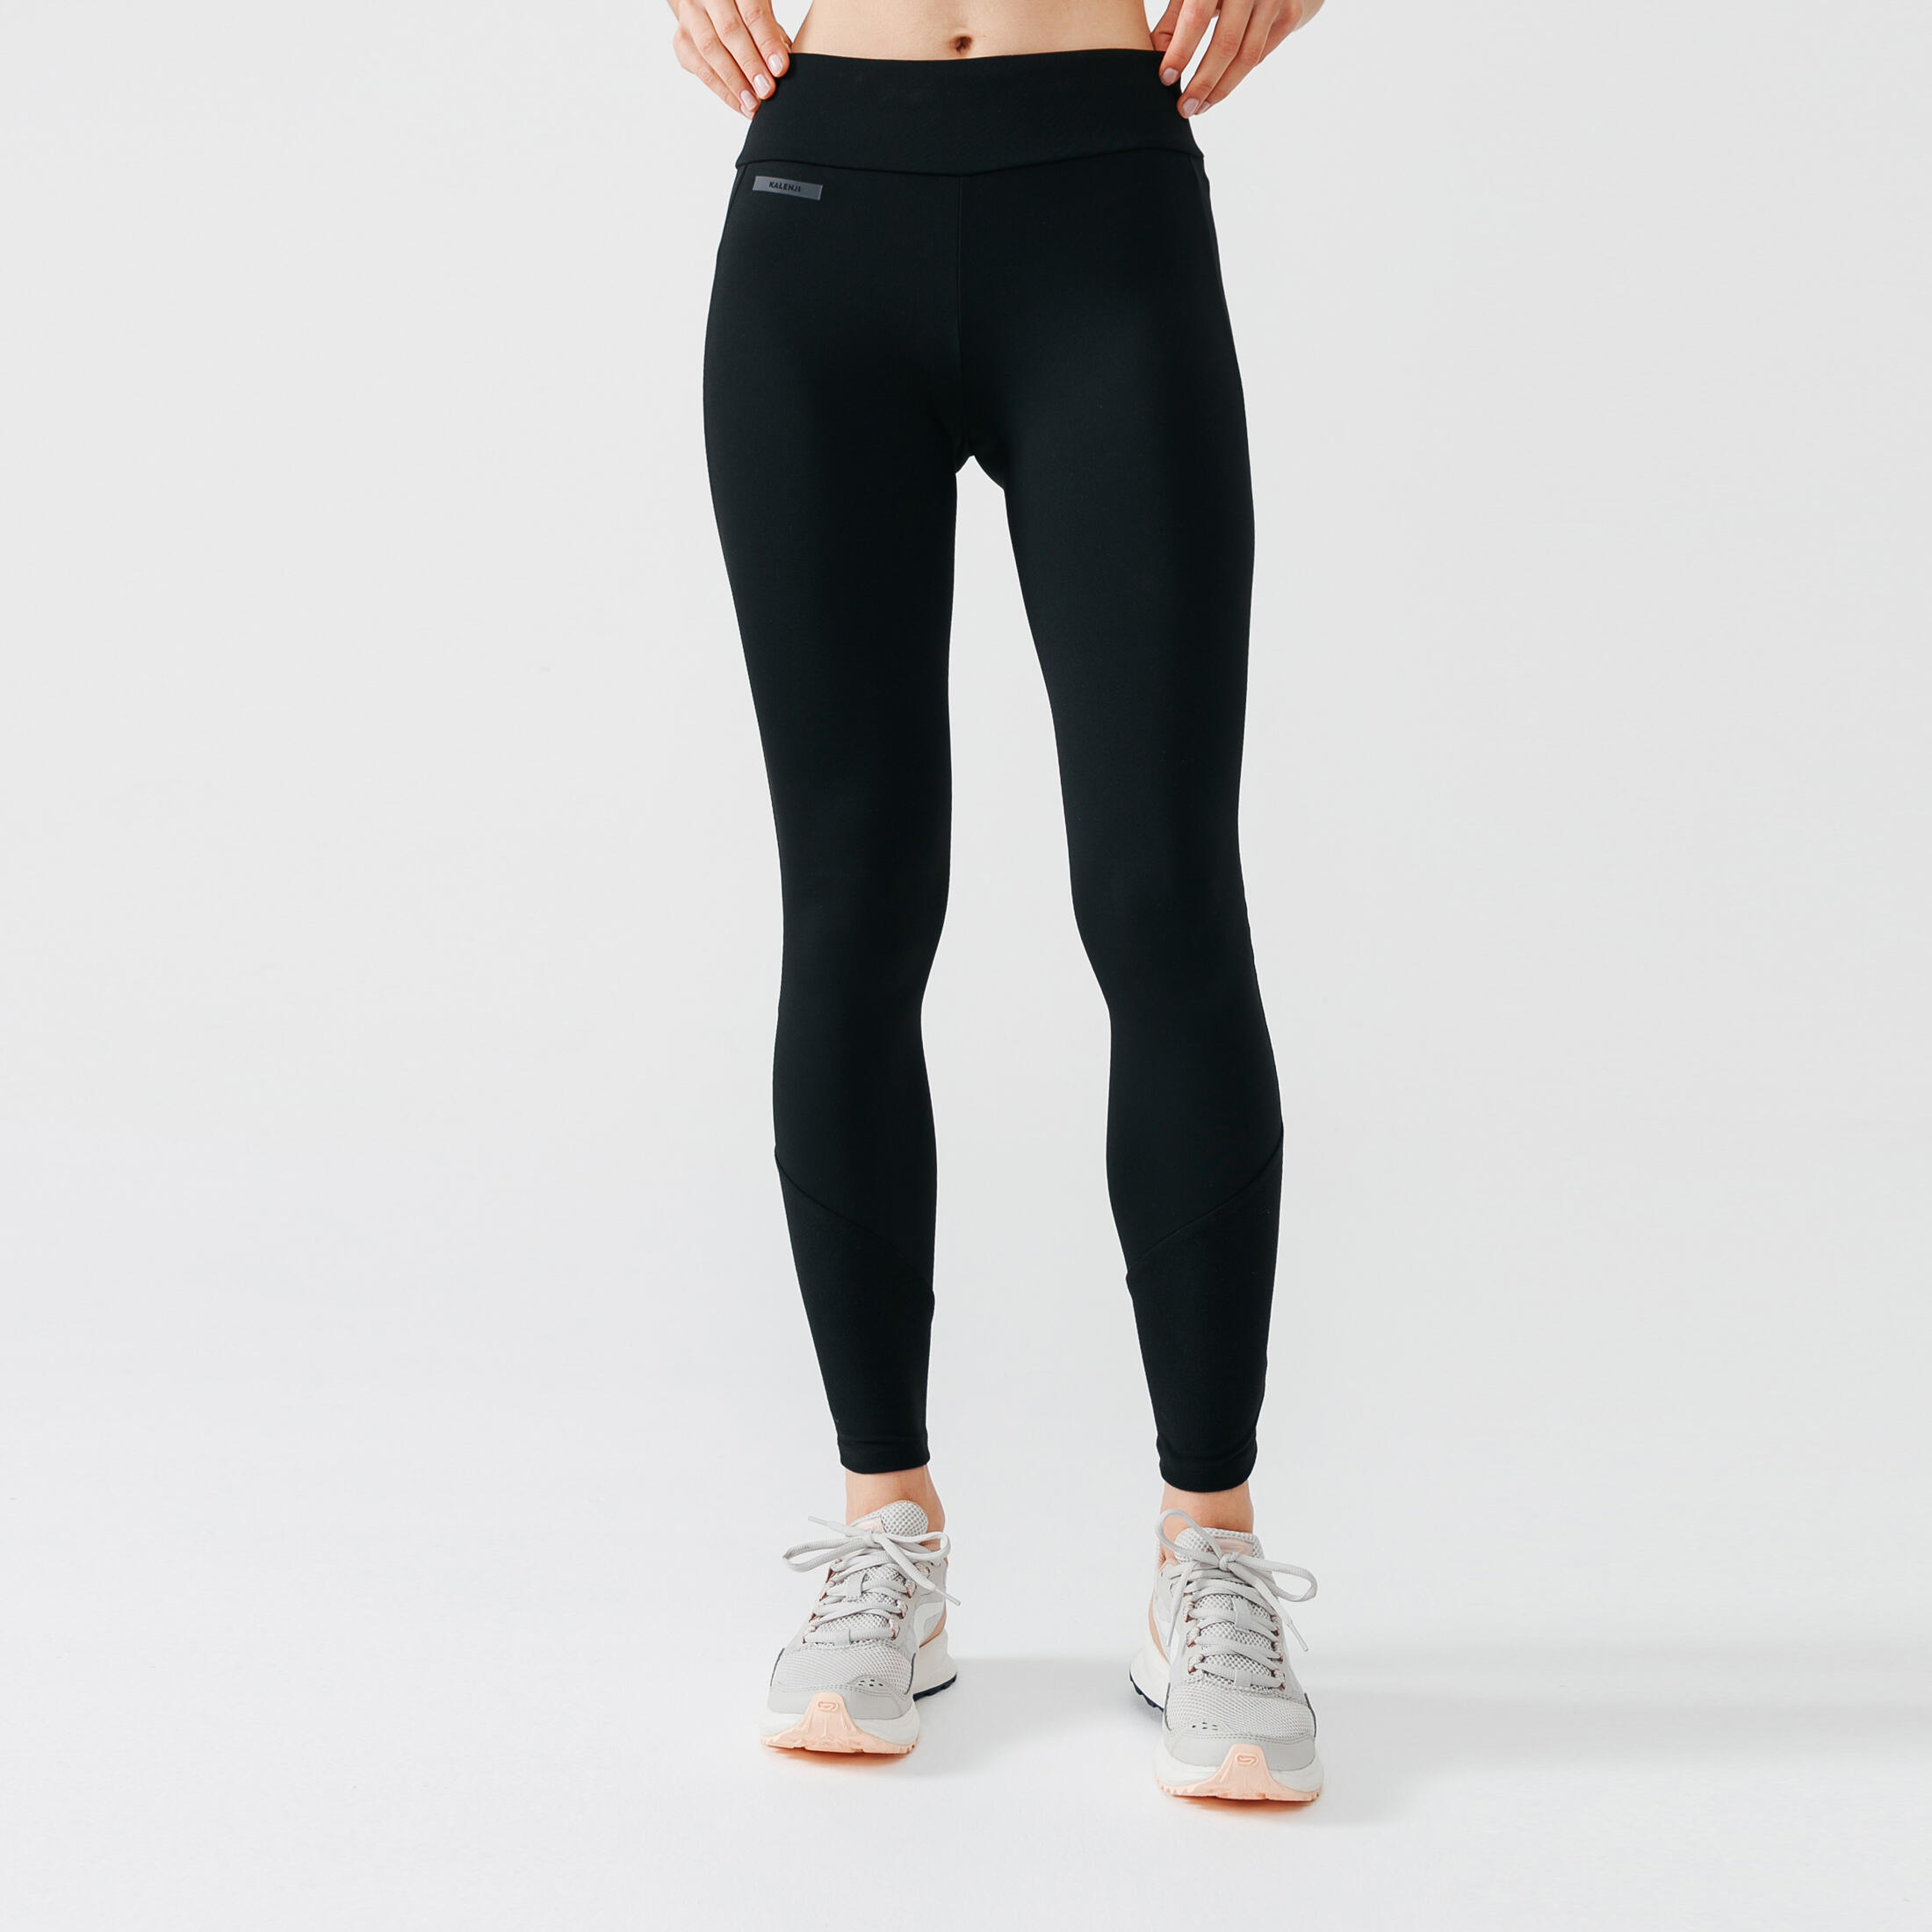 Run Warm Women'S Running Warm Tights - Black - UK18 / 2XL (L29) By KALENJI   Decathlon